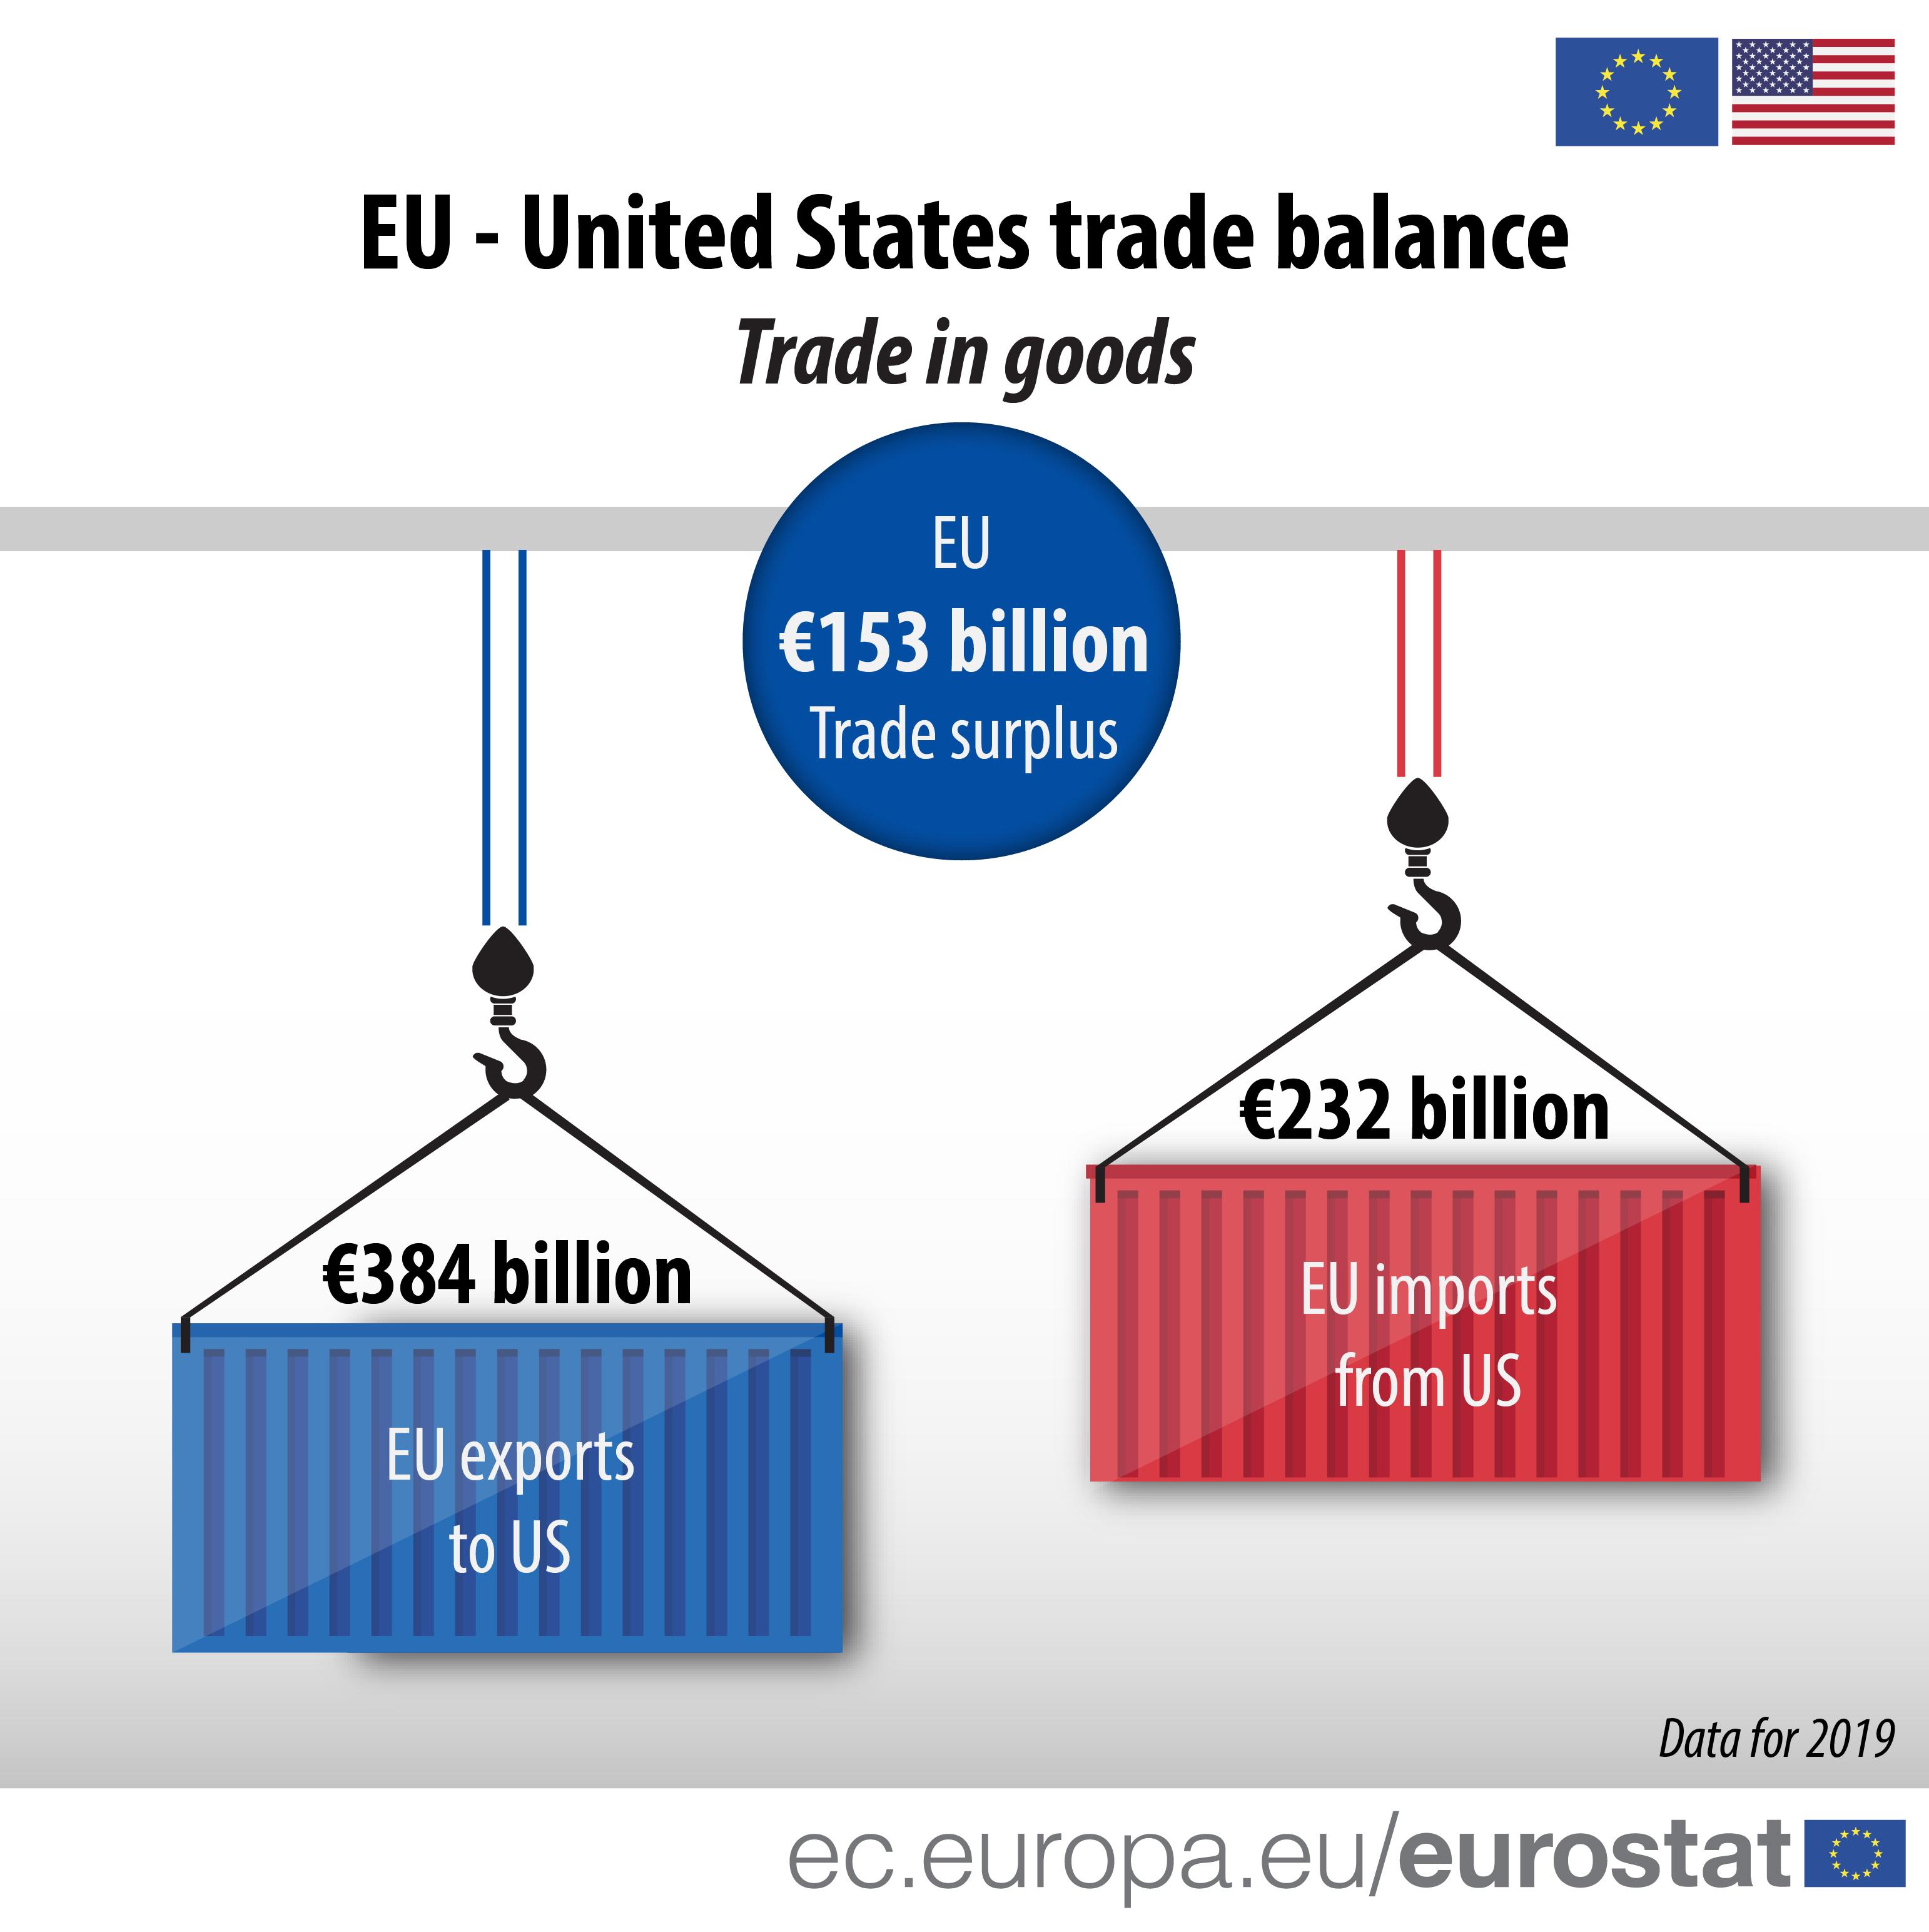 EU - US trade exports, imports and balance, 2019